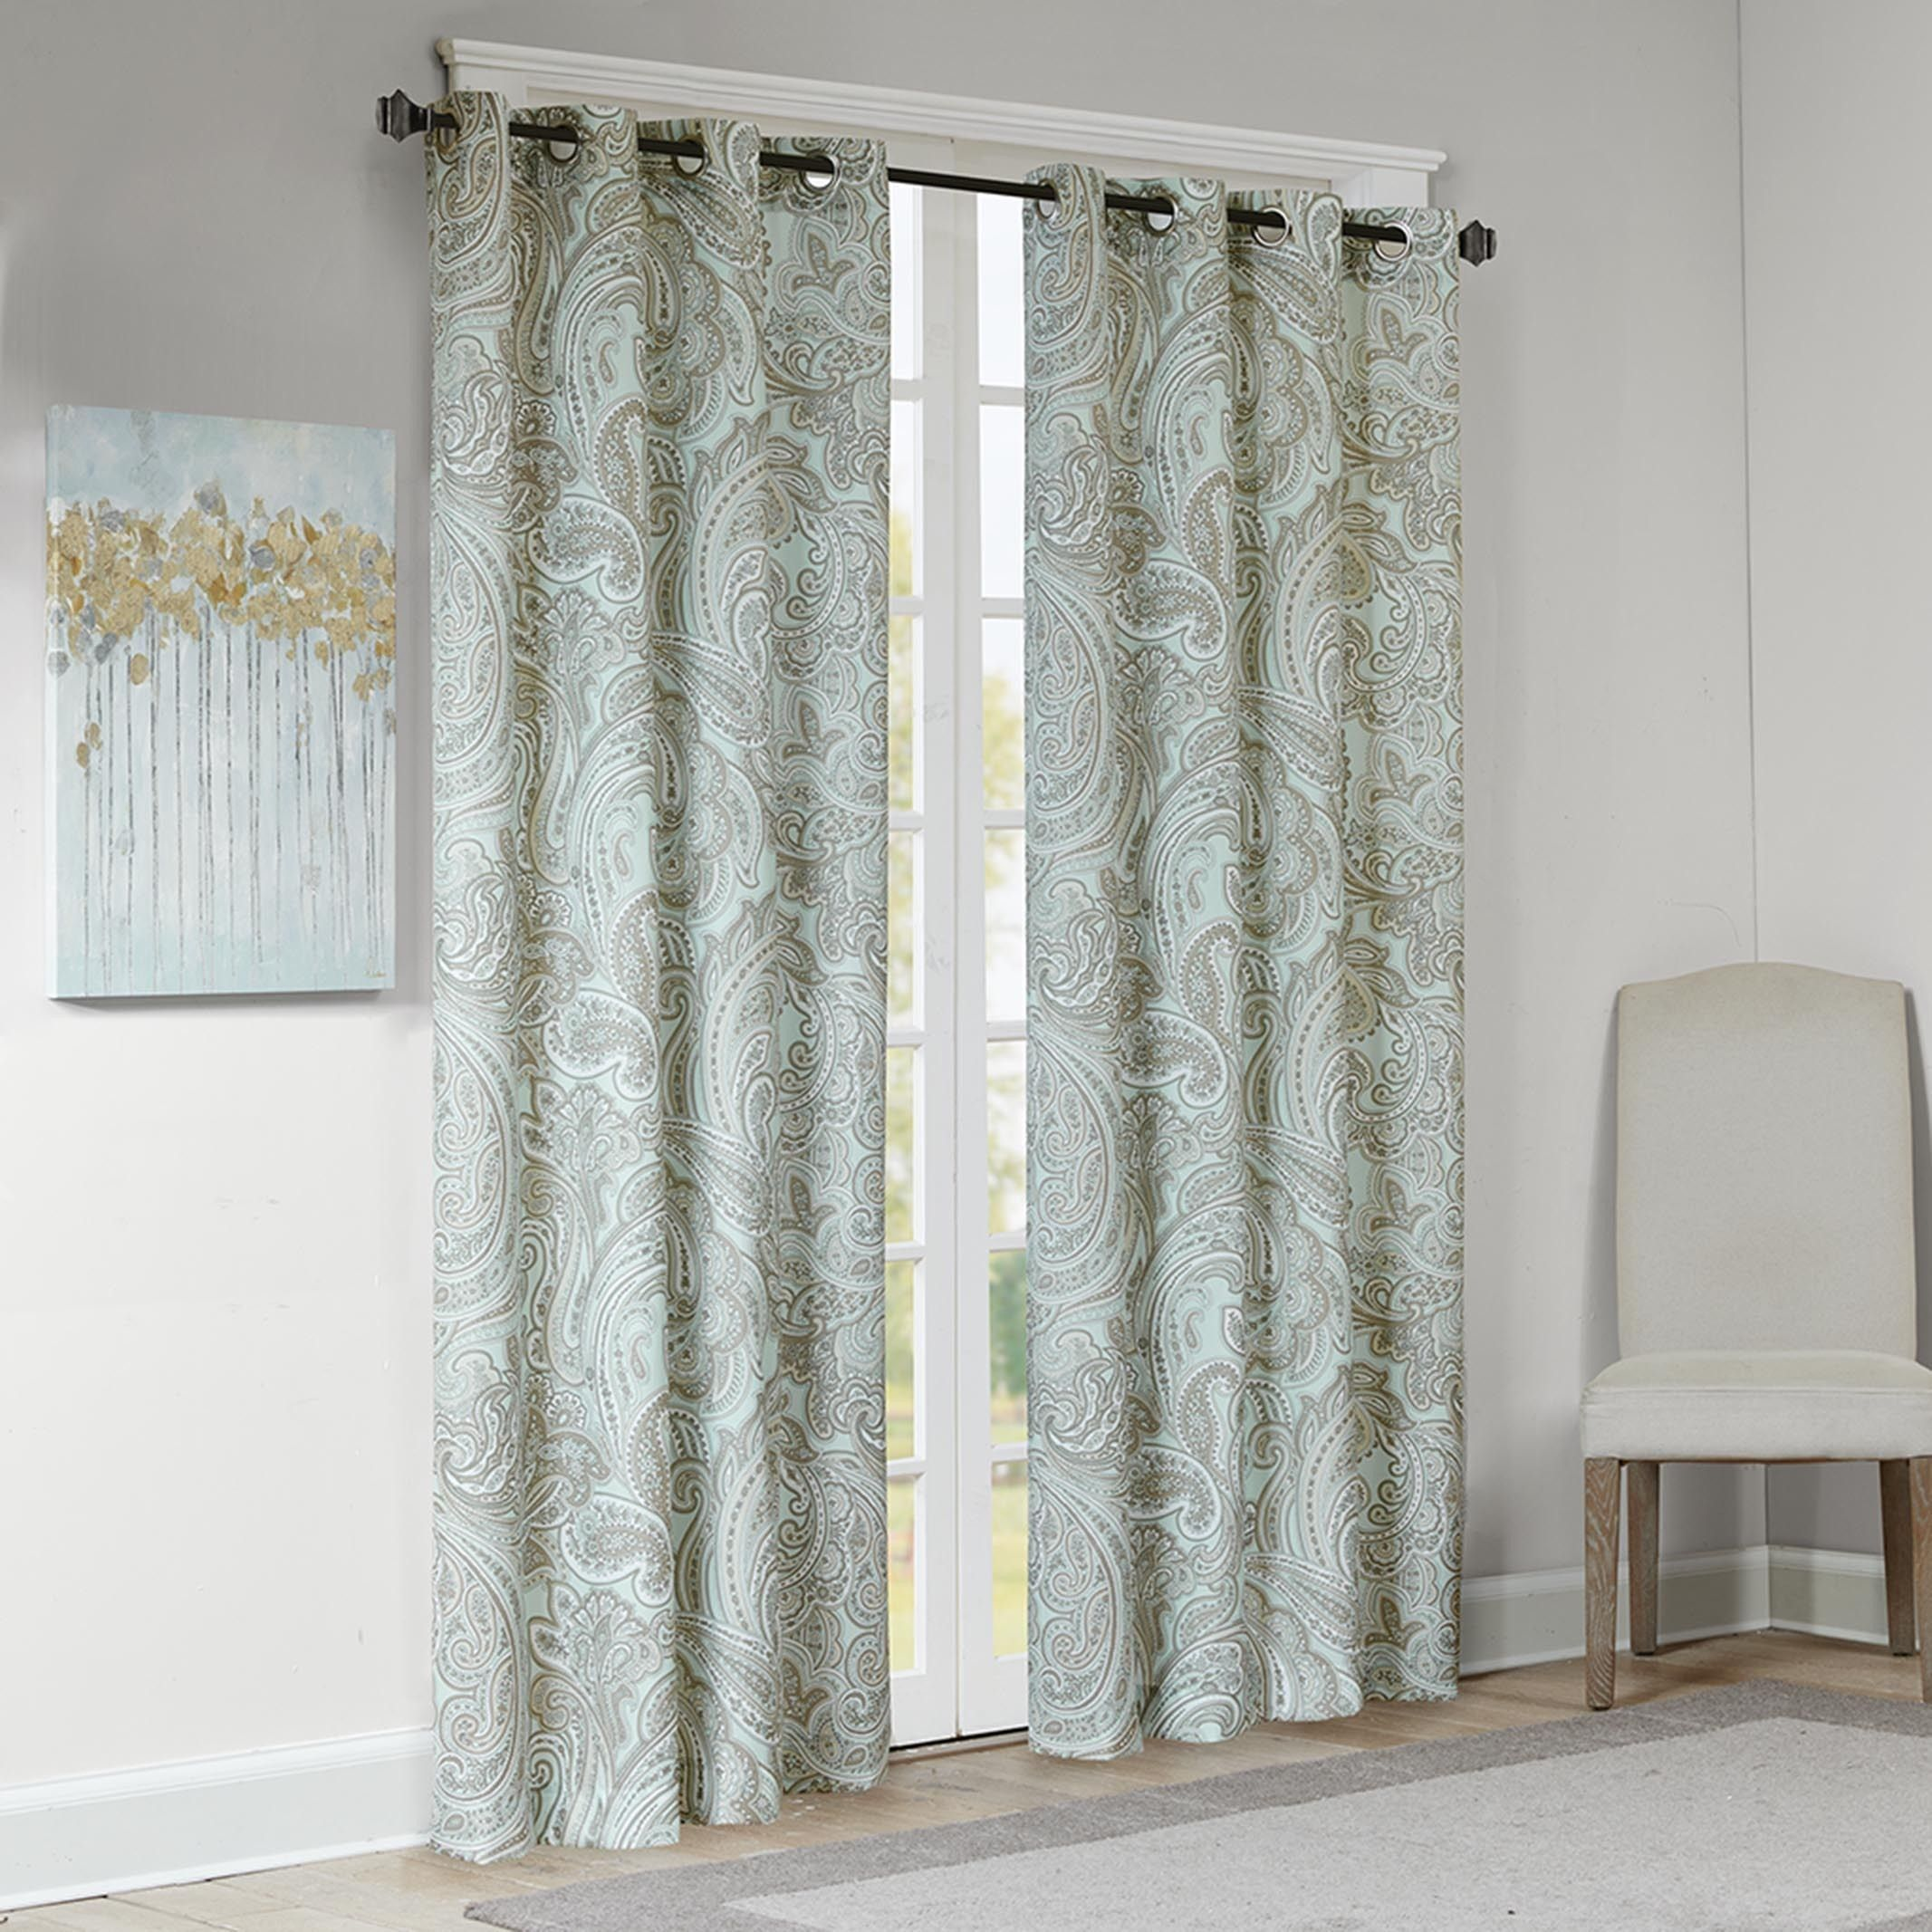 blue collections burnout curtain wonderhome cotton poly home panel curtains josephine wonder